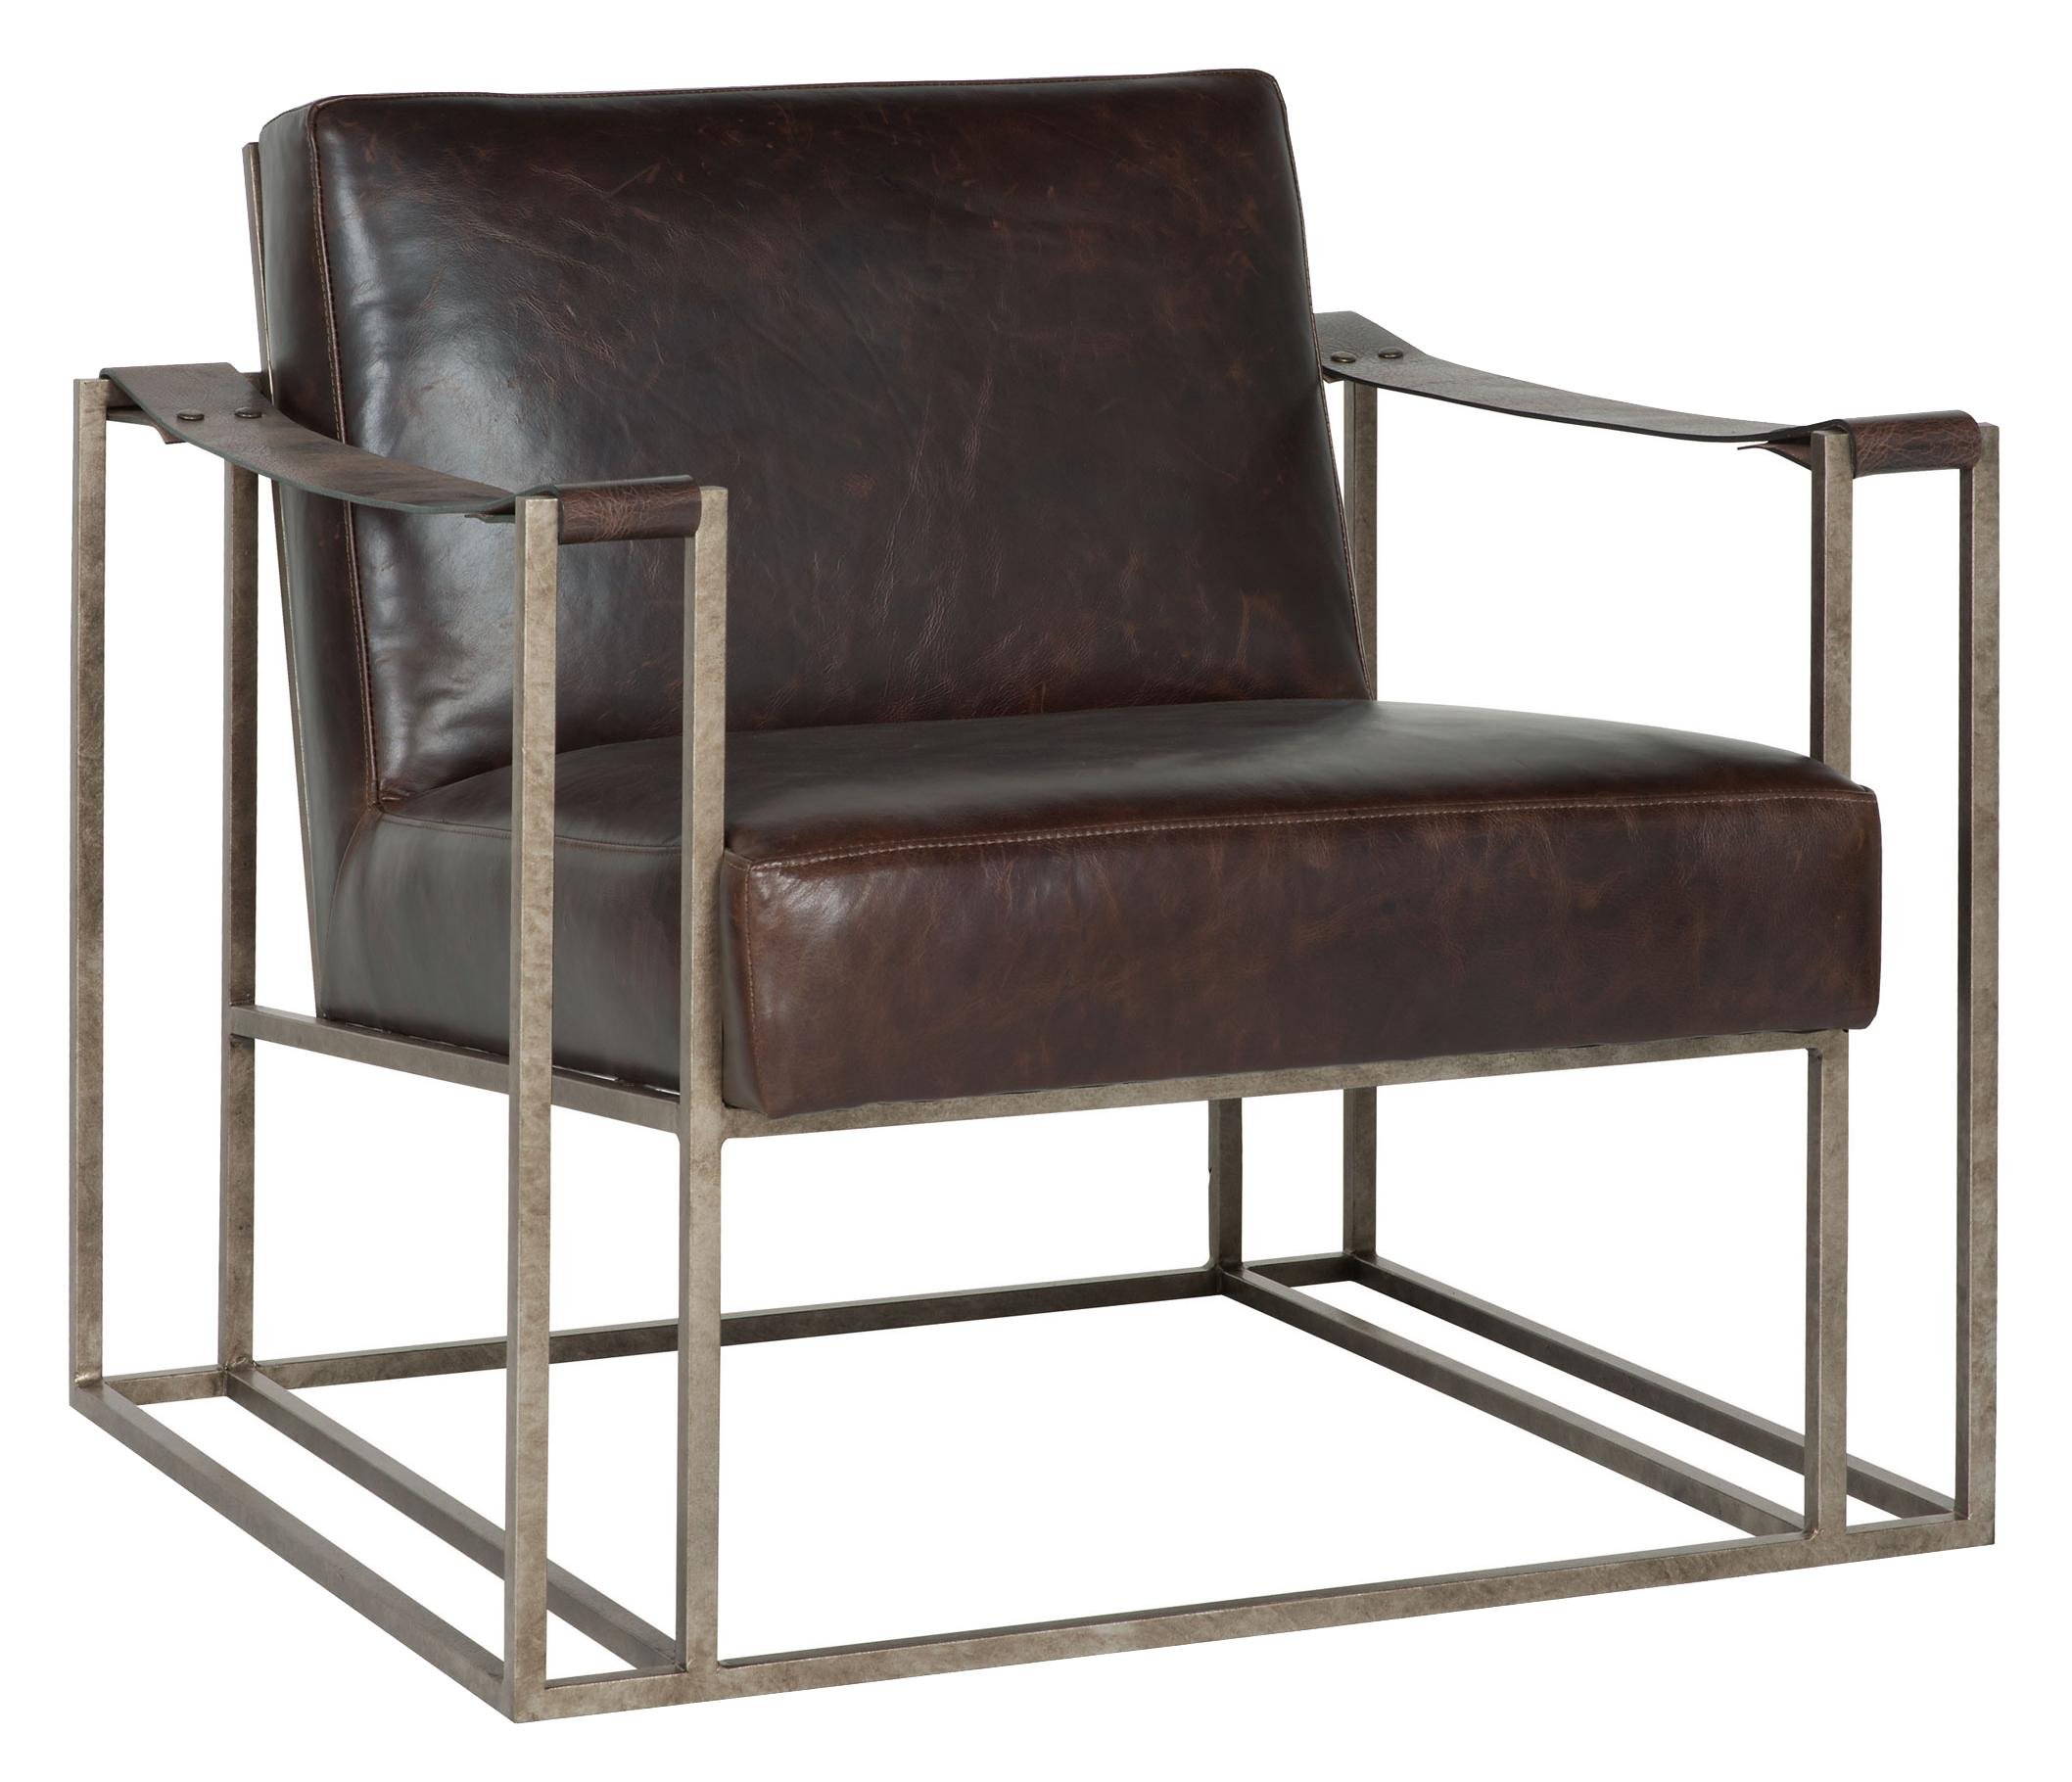 Bernhardt Dekker Industrial Leather Chair with Metal Arms